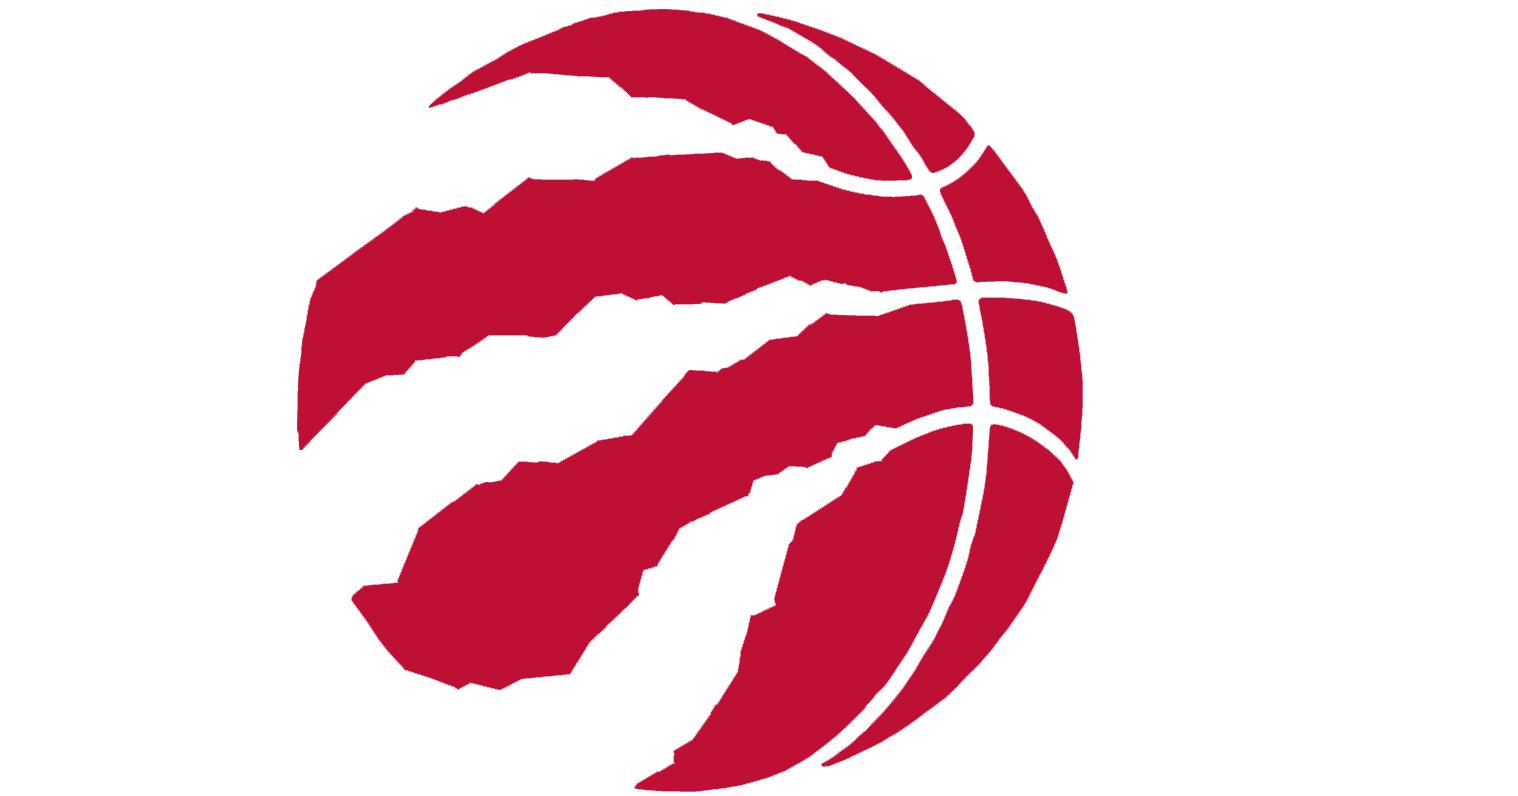 Toronto Raptors - Partial logo 1